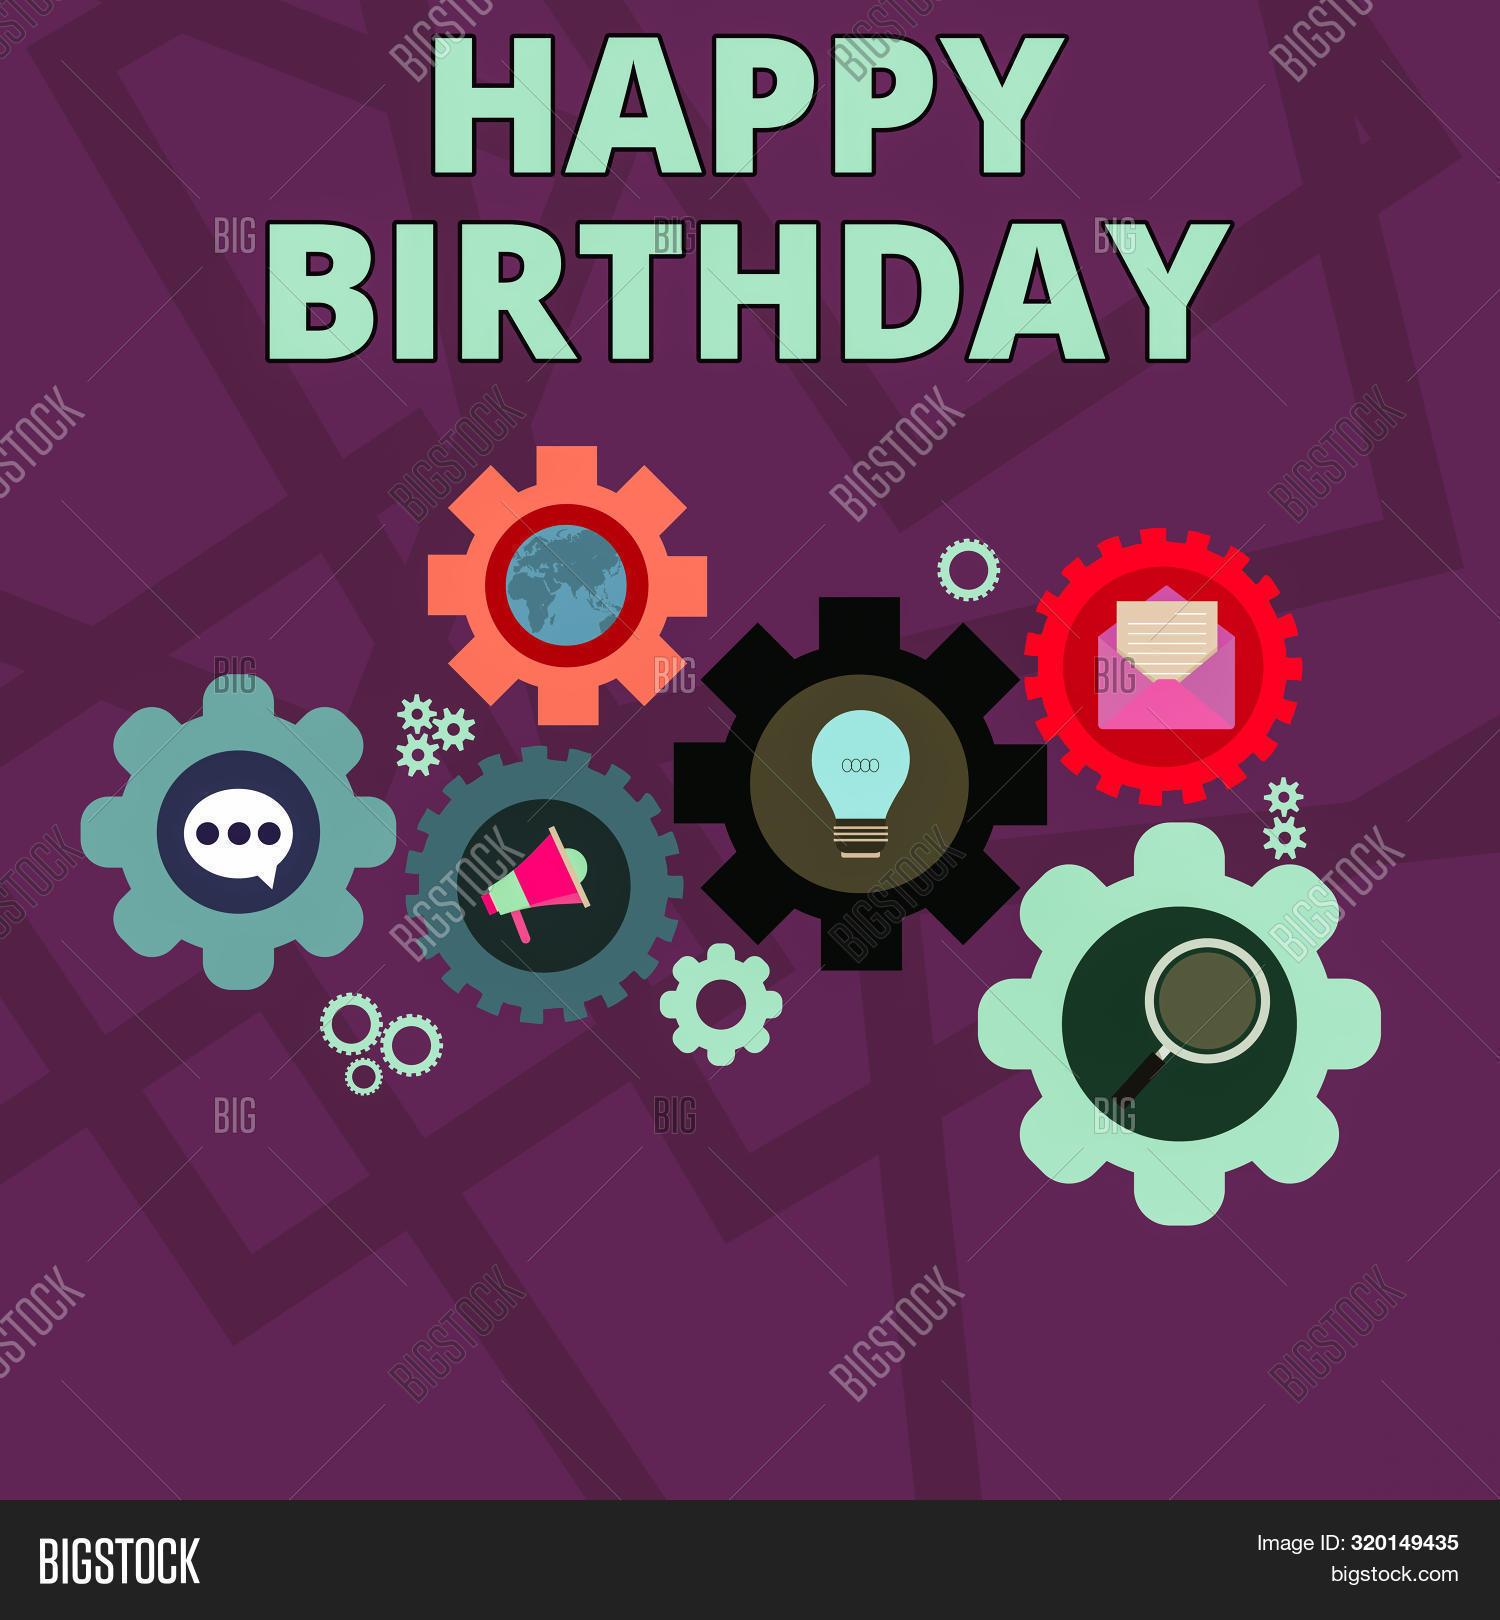 anniversary,birthday,blast,blowout,candle,card,carousal,ceremony,festival,festivity,gaiety,gala,gifts,glorification,honoring,invitation,jollification,joviality,jubilation,jubilee,keeping,magnification,massage,memorialization,merriment,merrymaking,observance,party,perforanalysisce,presentation,recognition,remembrance,revelry,saturnalia,solemnization,spree,triumph,wingding,wish